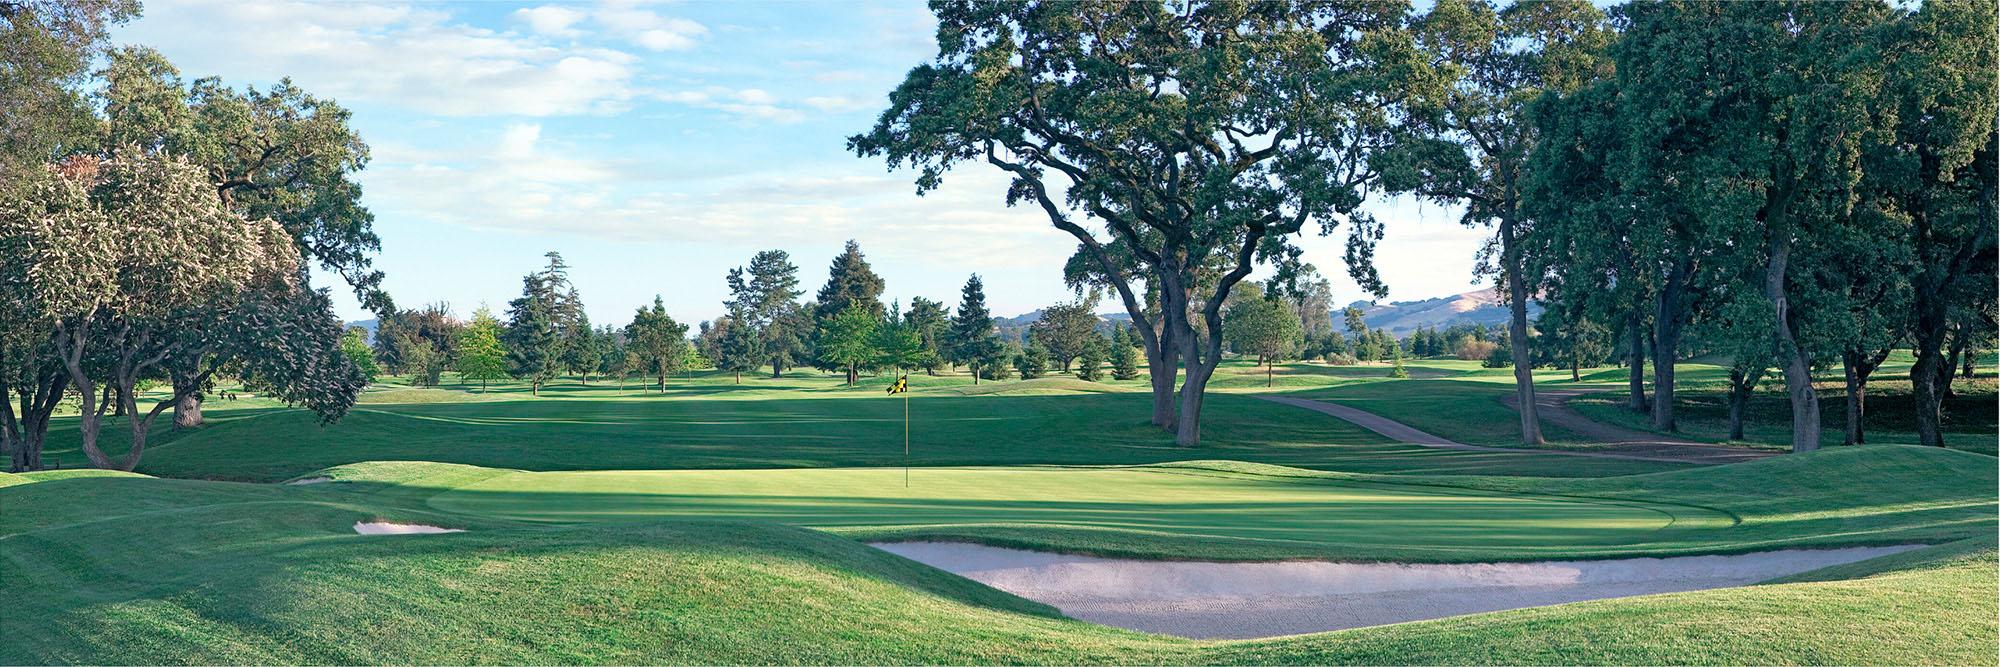 Golf Course Image - Sonoma No. 18